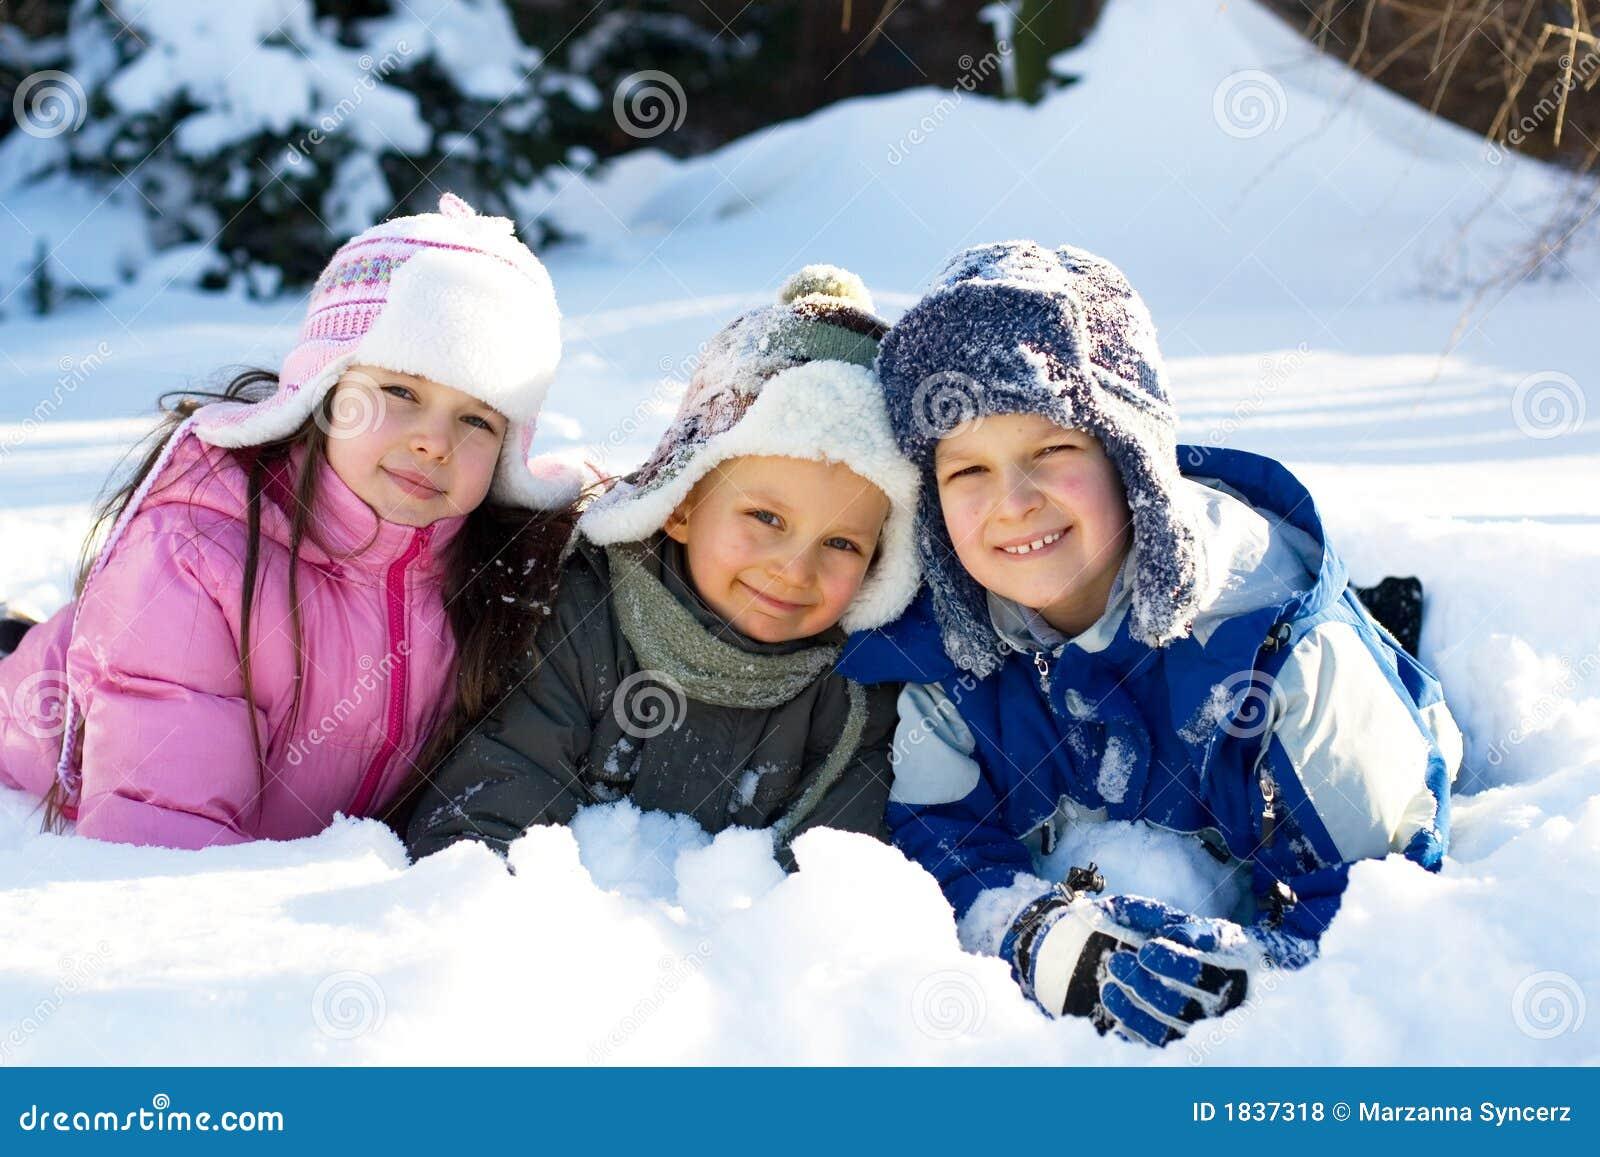 Three Children Playing In Snow Stock Photo - Image: 1837318